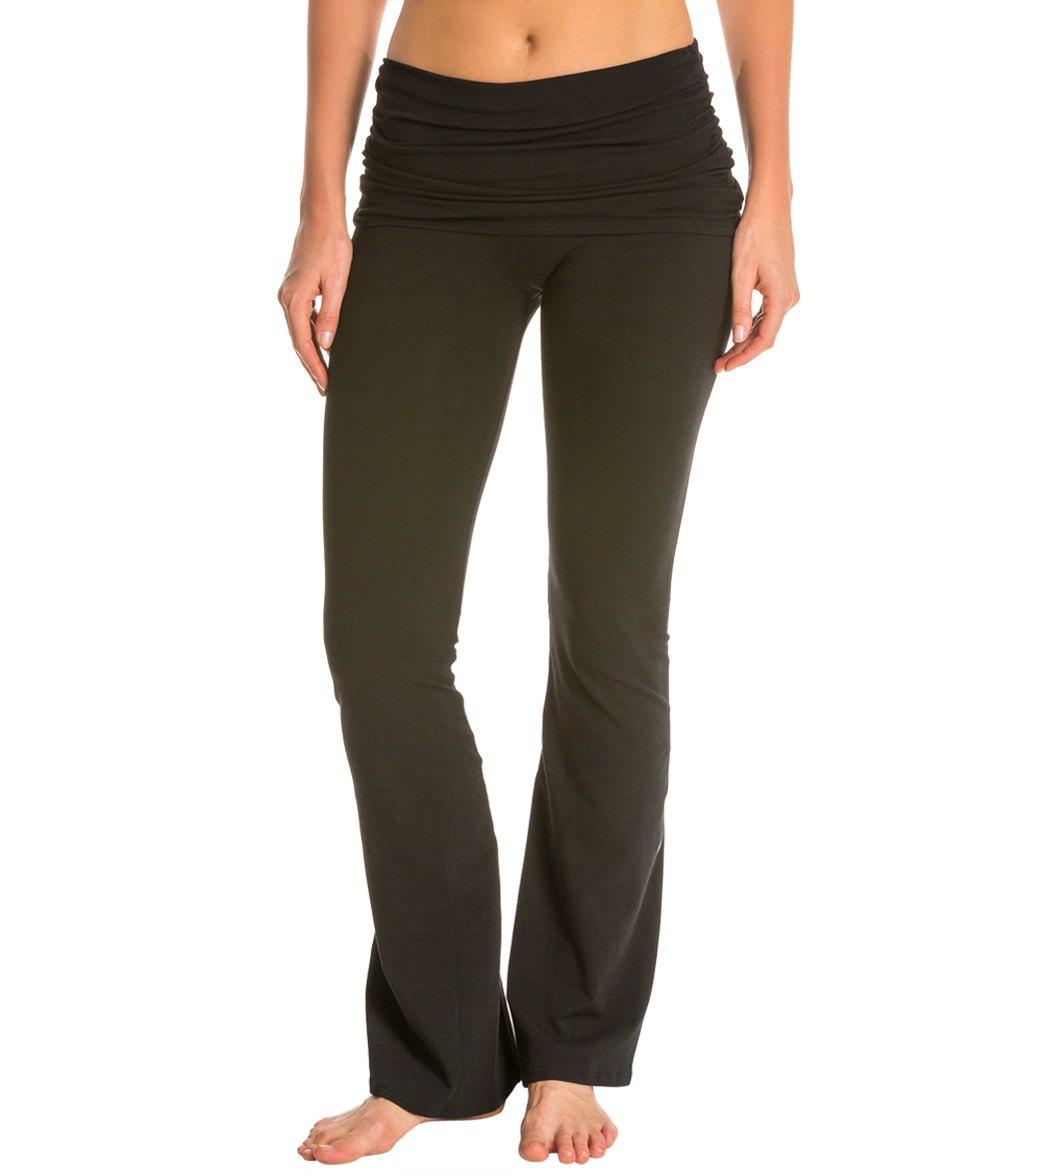 Jala Pranayama Cotton Yoga Pant At Yogaoutlet Free Shipping